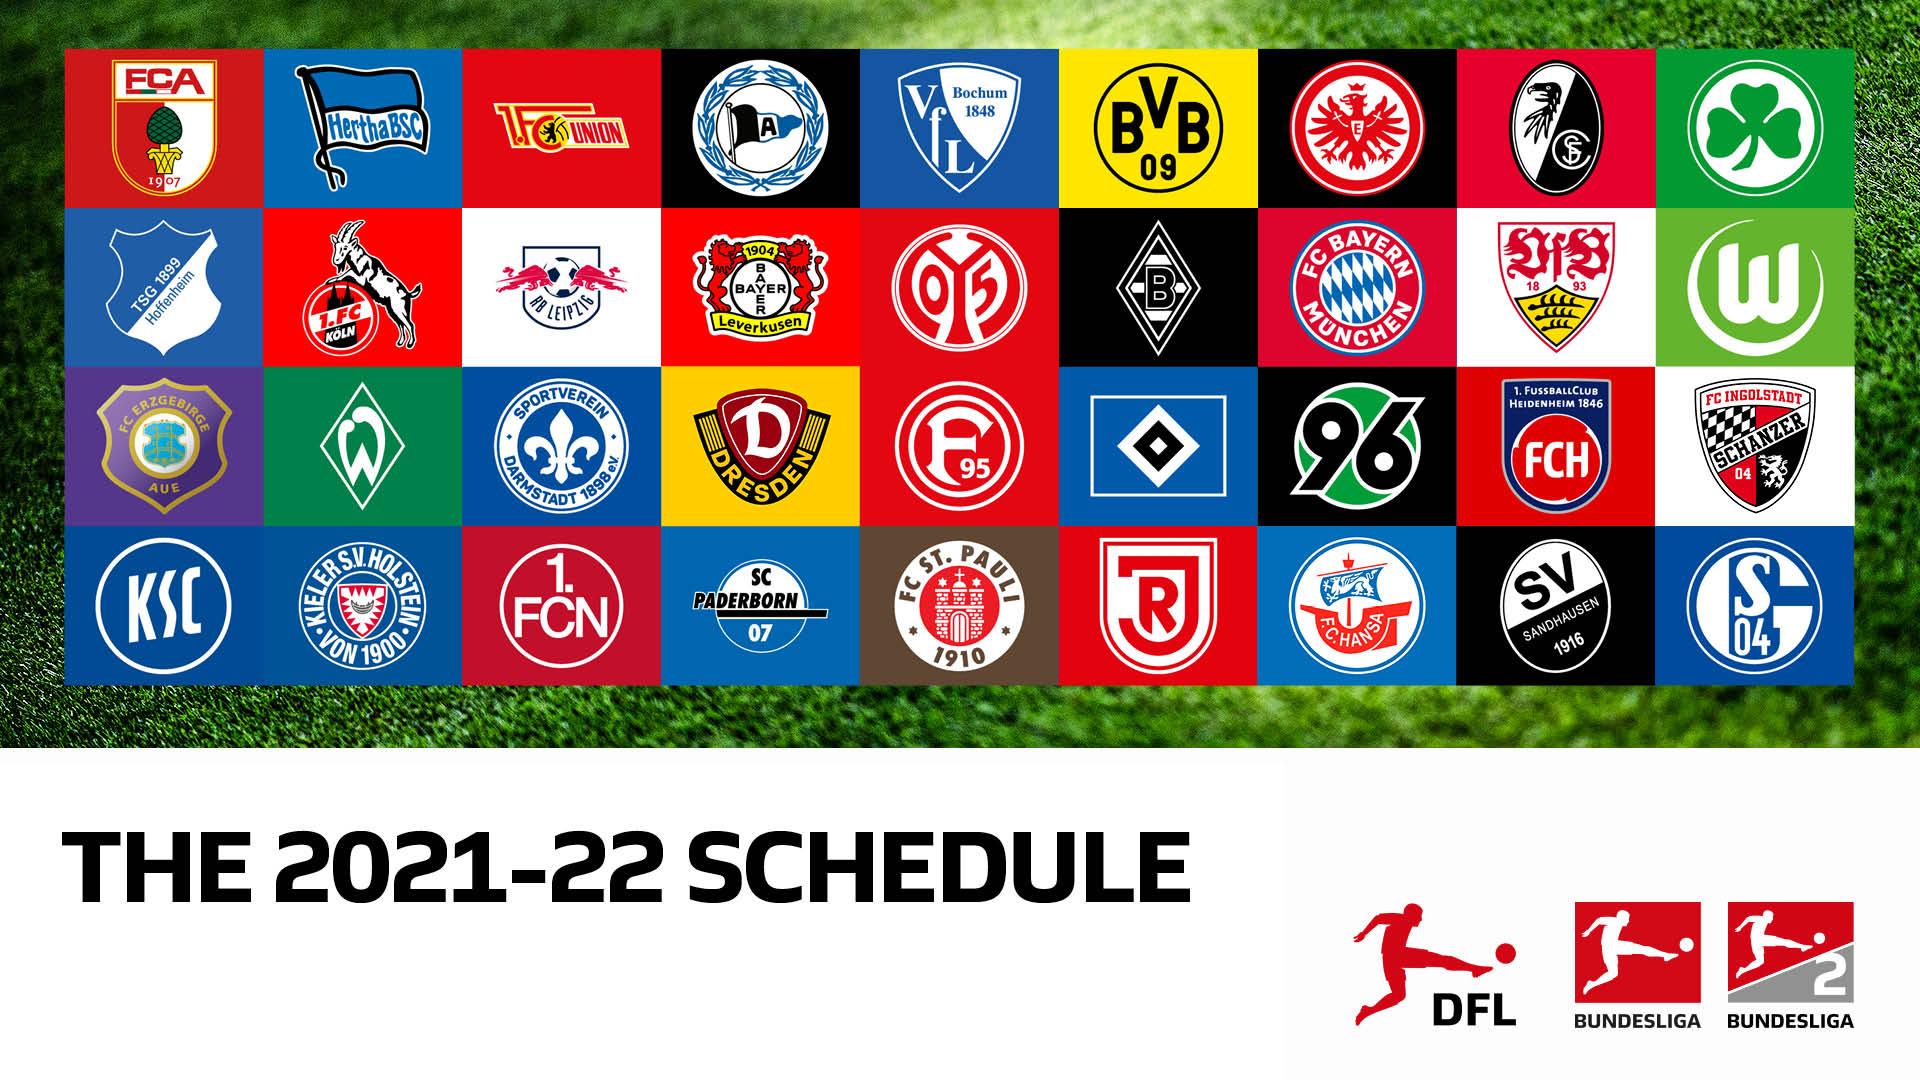 Uzivatel Dfl Deutsche Fussball Liga Na Twitteru The Fixtures Of The 2021 22 Bundesliga And Bundesliga 2 Seasons Will Be Announced On June 25 Https T Co U7vmxftx1n Twitter